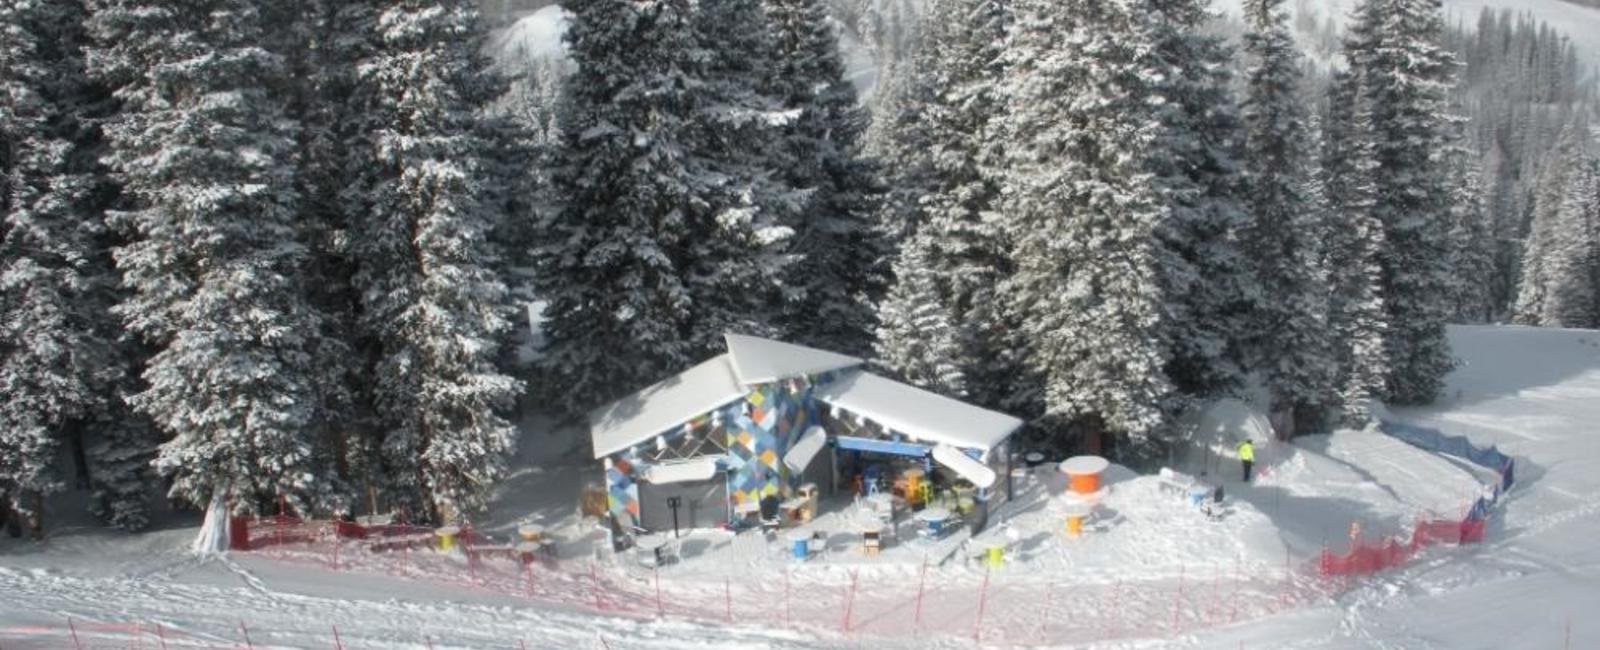 Disney's Cloud 9 Snowboarding Movie Shot in Utah